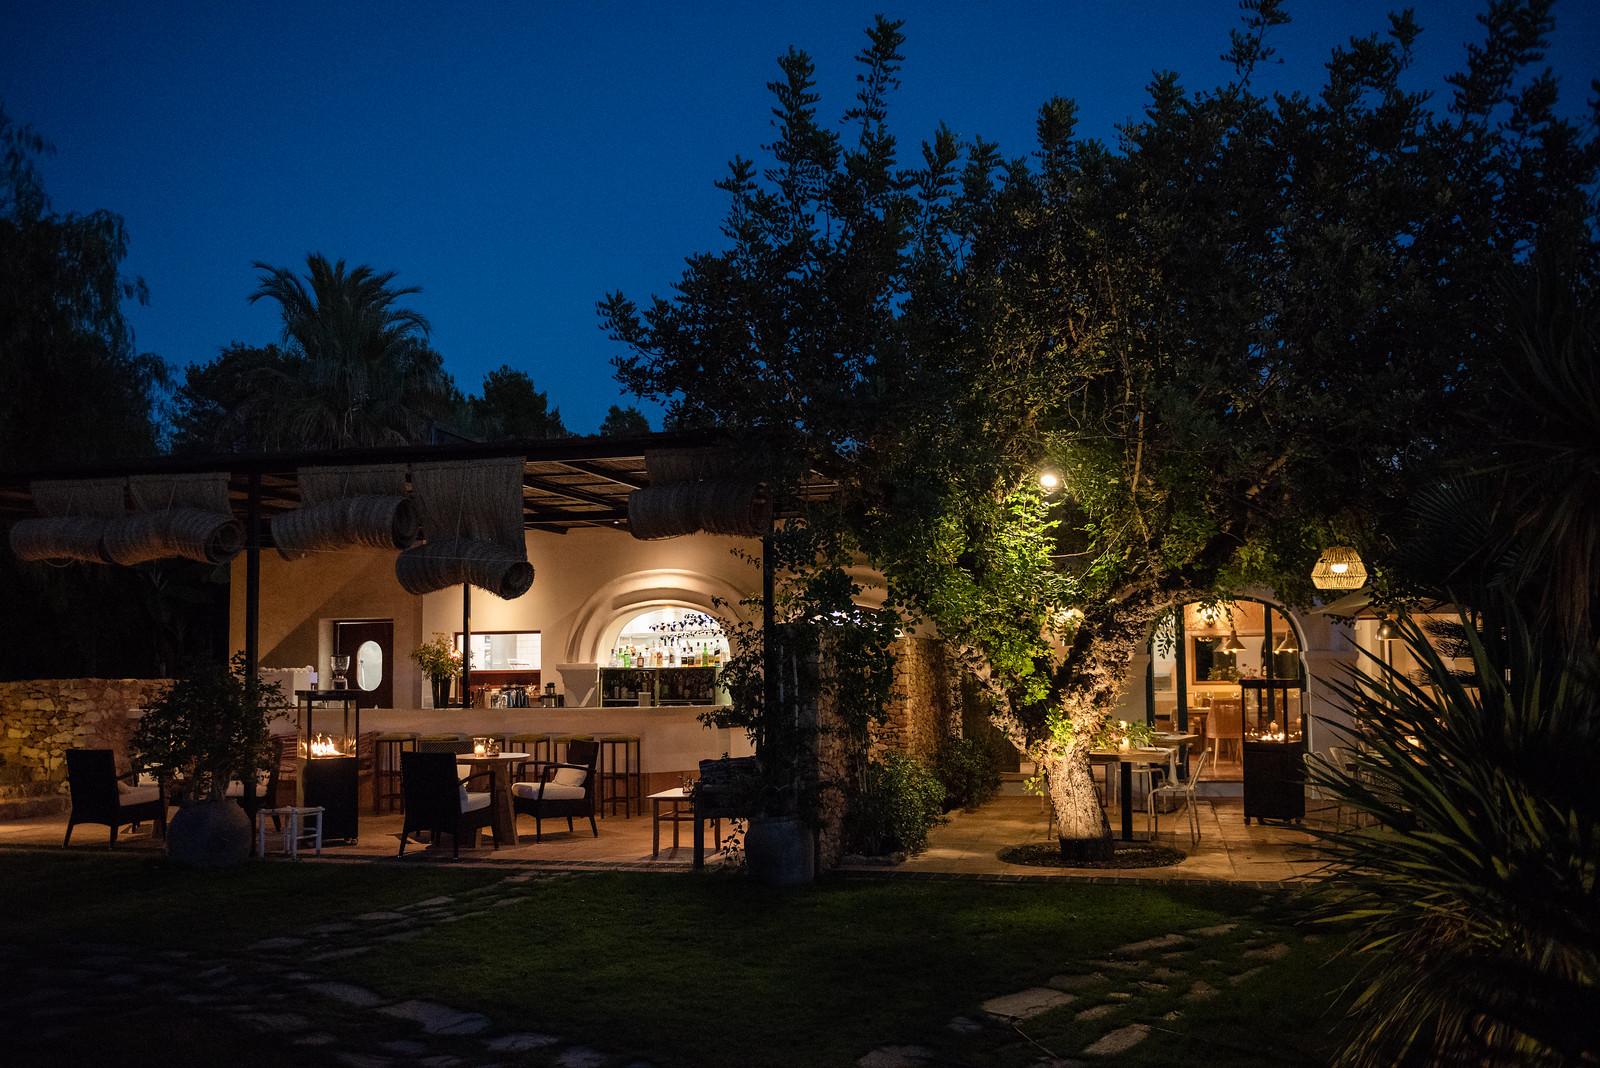 https://www.white-ibiza.com/wp-content/uploads/2020/11/cas-gasi-restaurant-2020-15.jpg